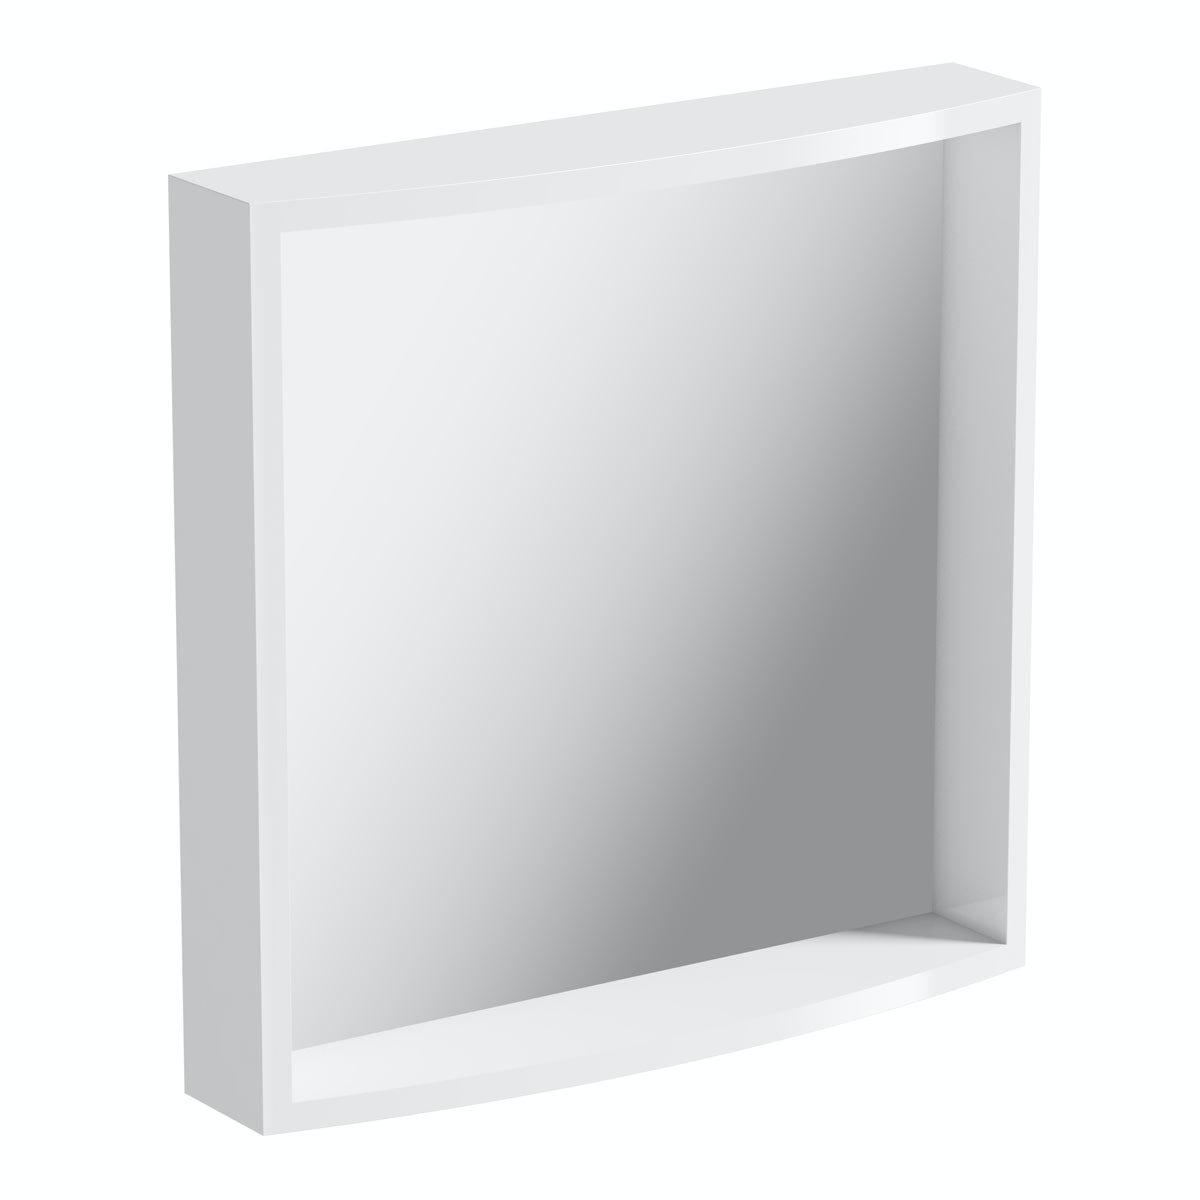 Mode Harrison snow bathroom mirror